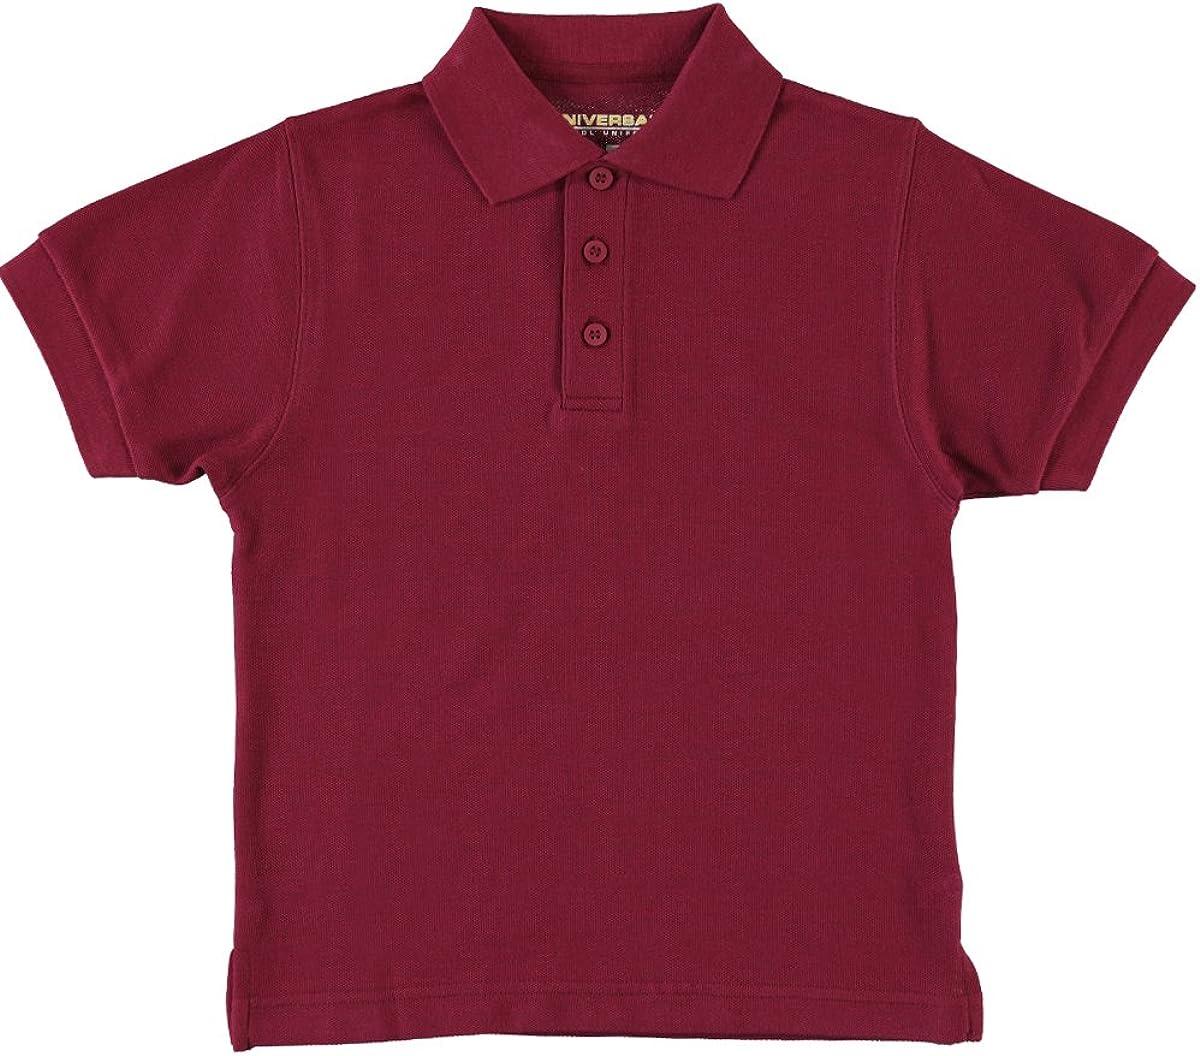 Universal School Uniform Baby Boys Short Sleeve Pique Polo Burgundy Size 2T